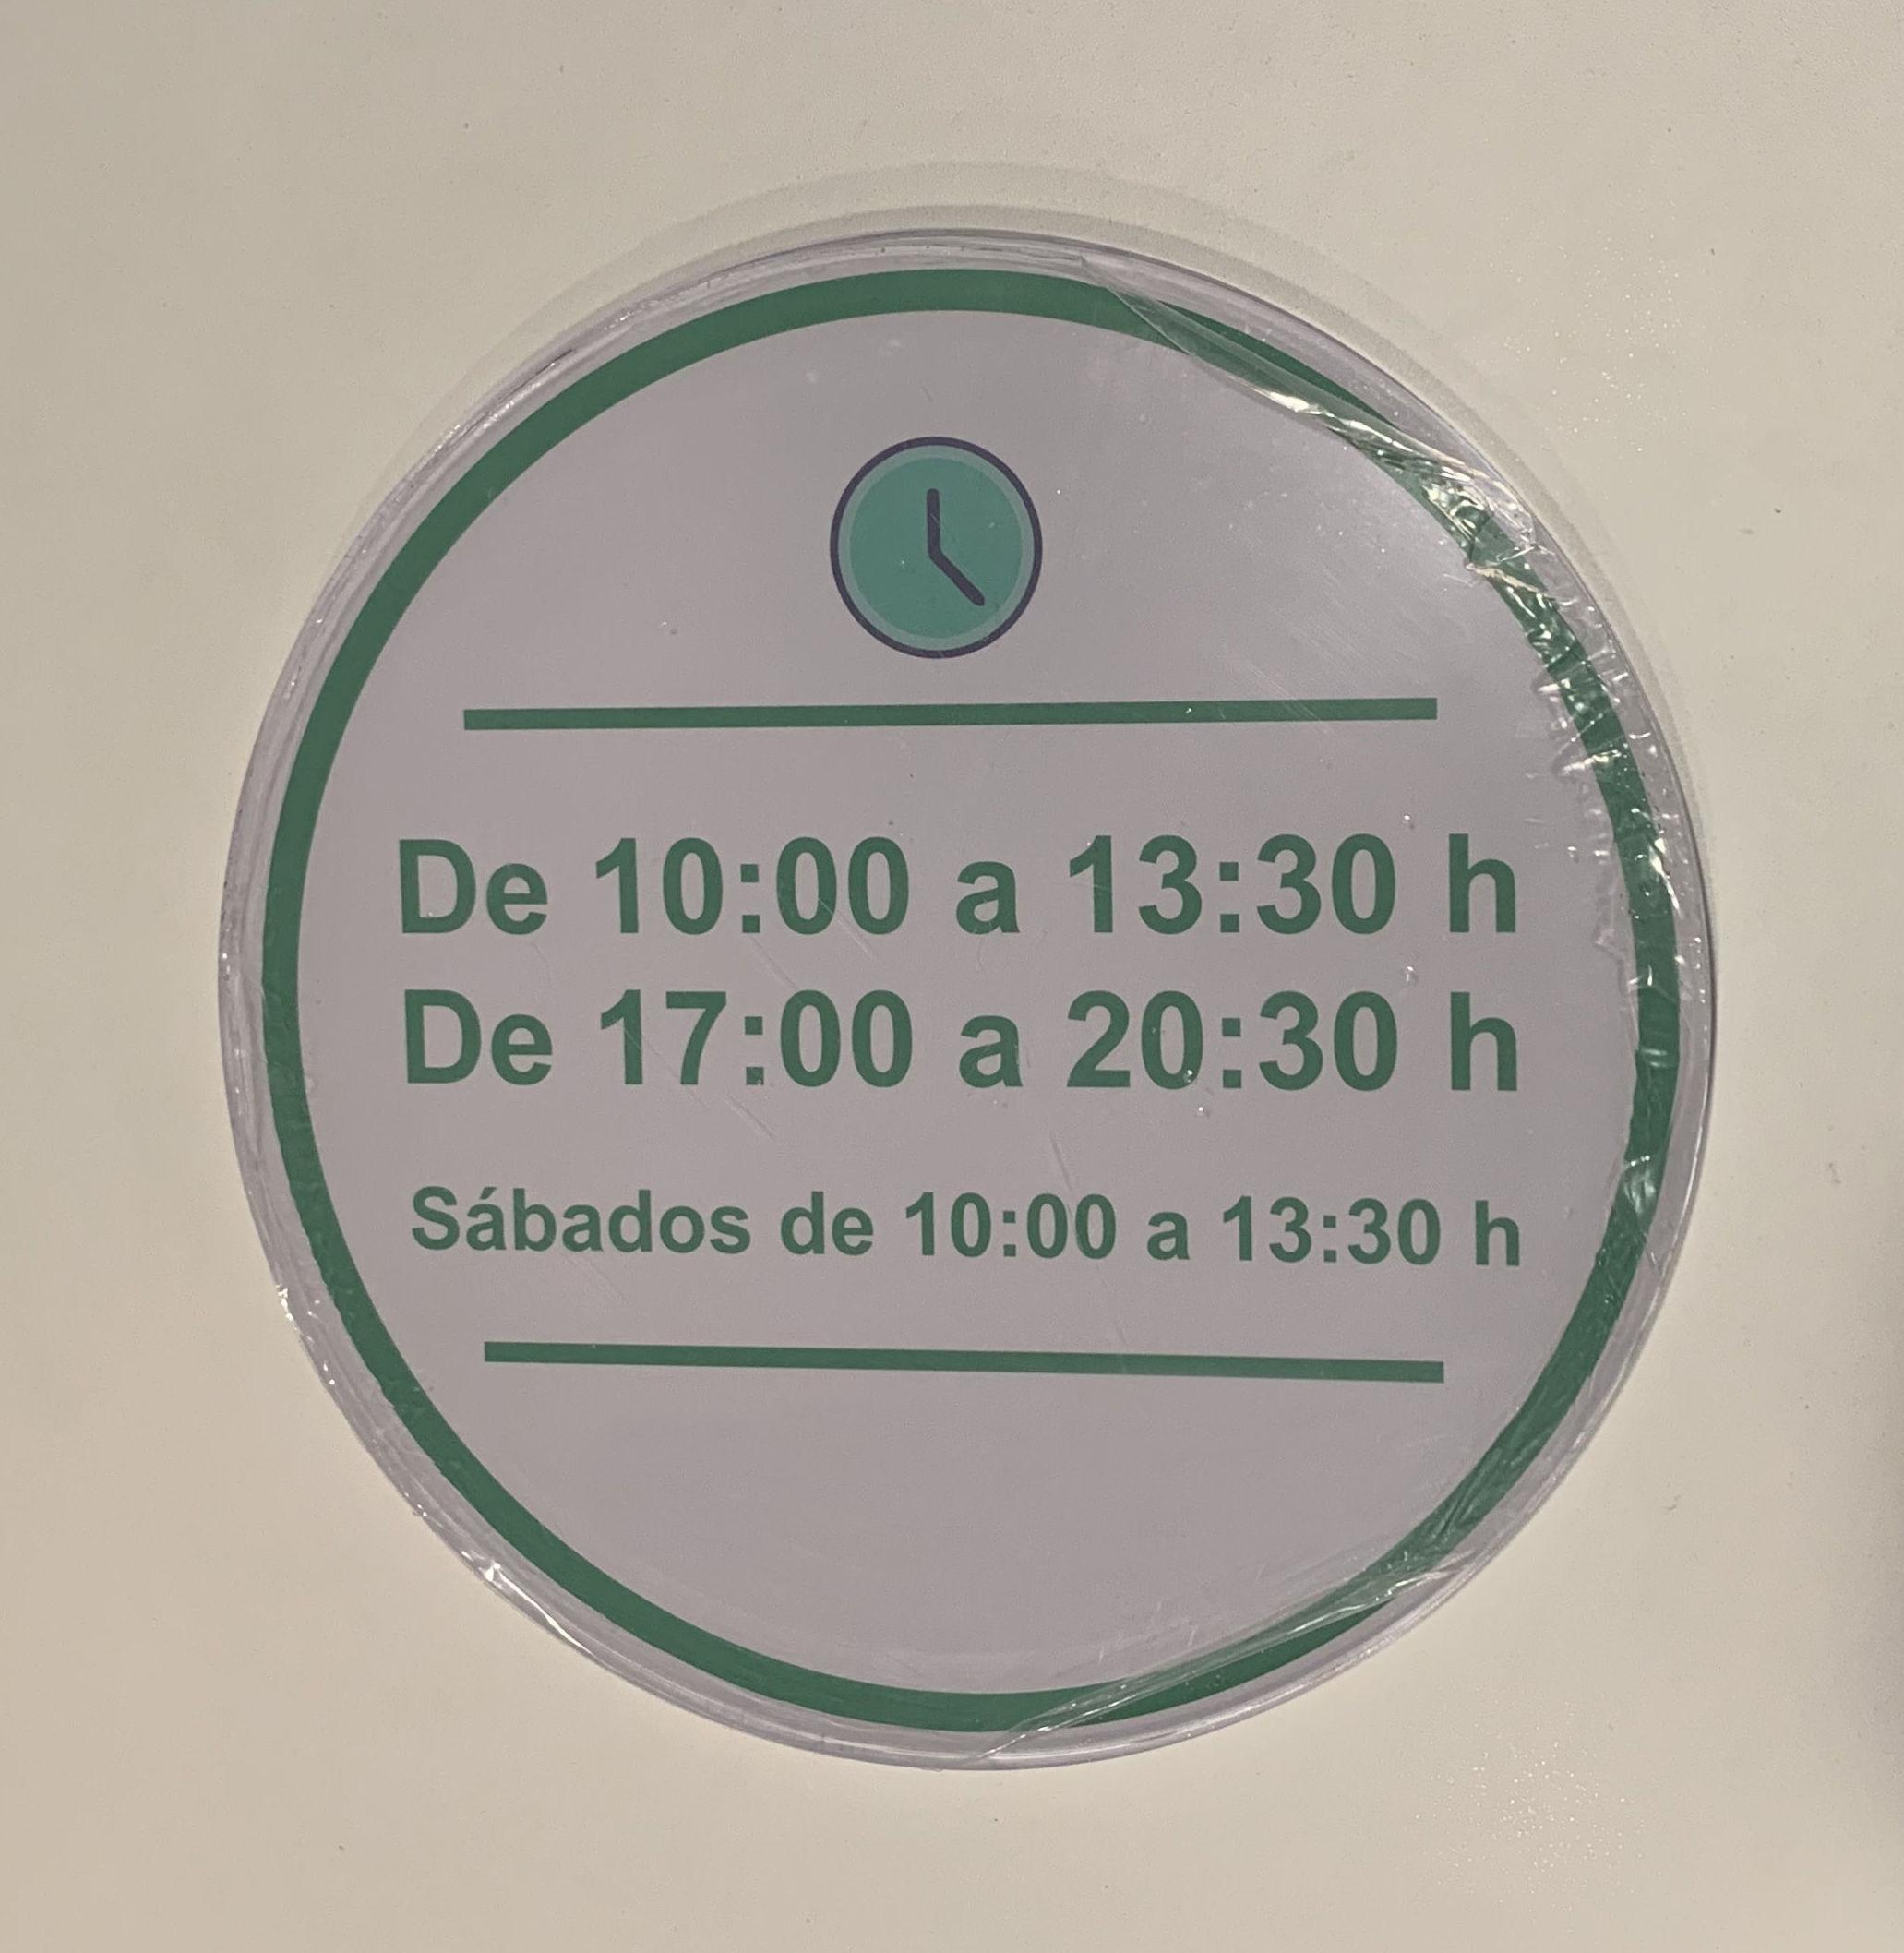 Metacrilato circular con gráfica trasera en vinilo impreso